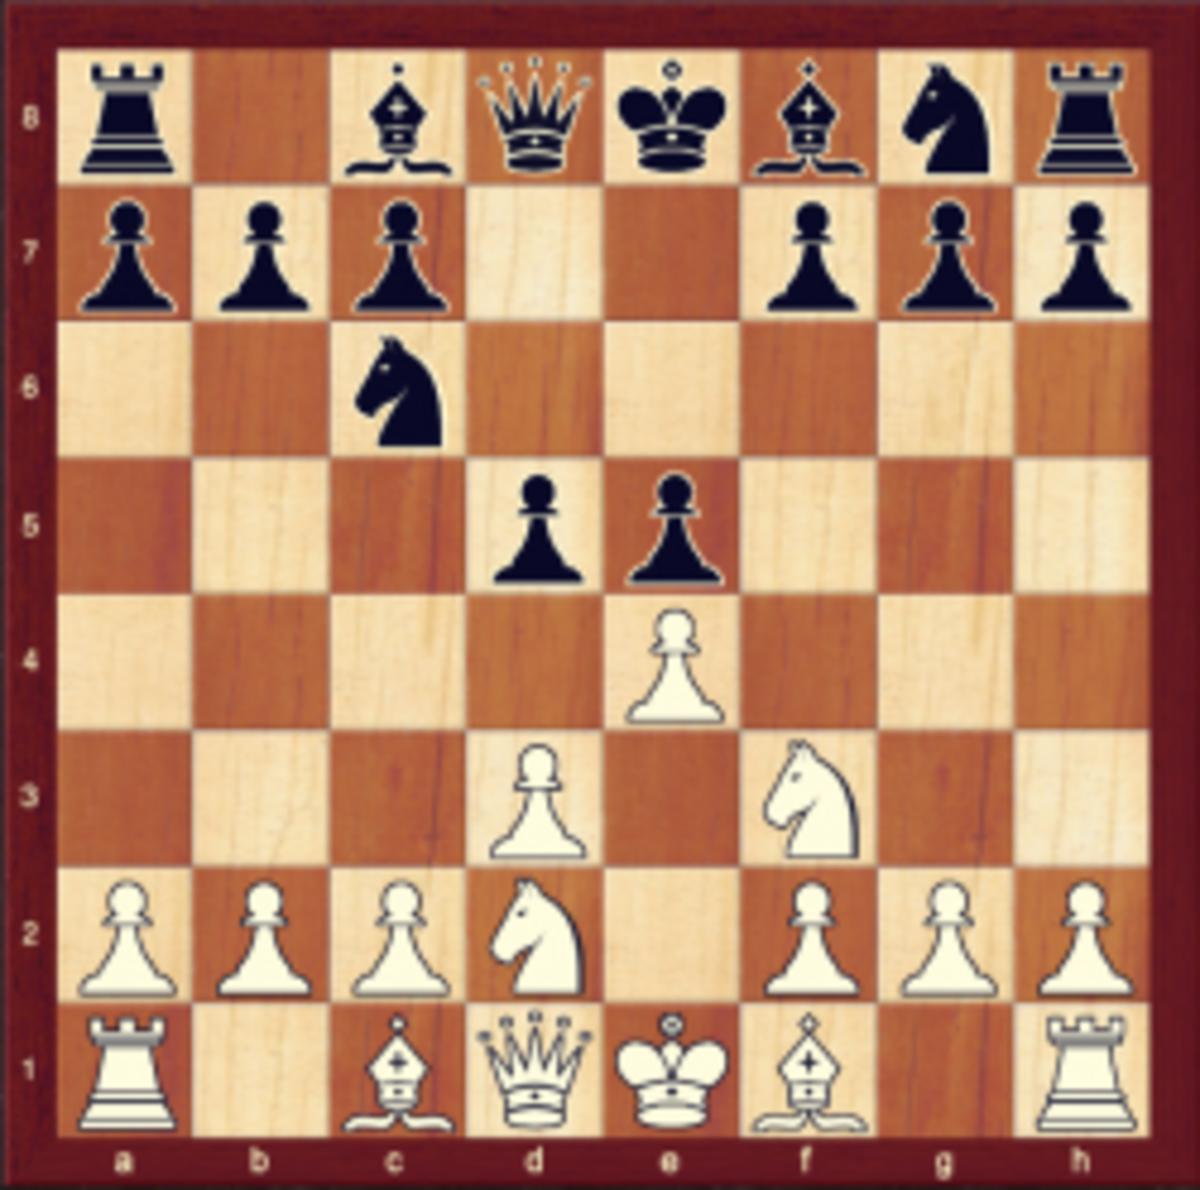 4. e4 taking control of the center